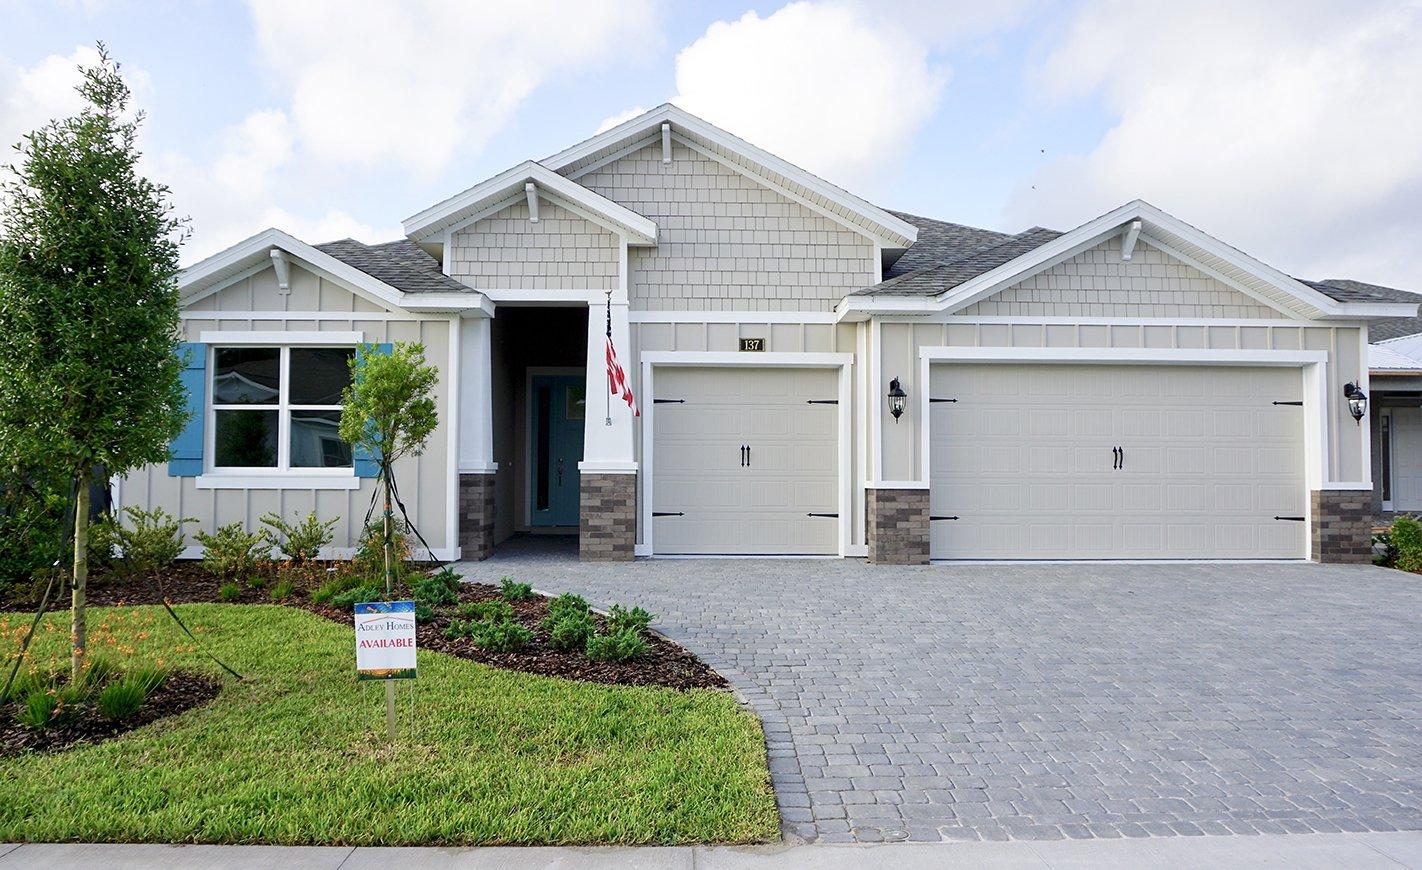 Daytona Beach Homes for Sale - The Atlantic at Mosaic